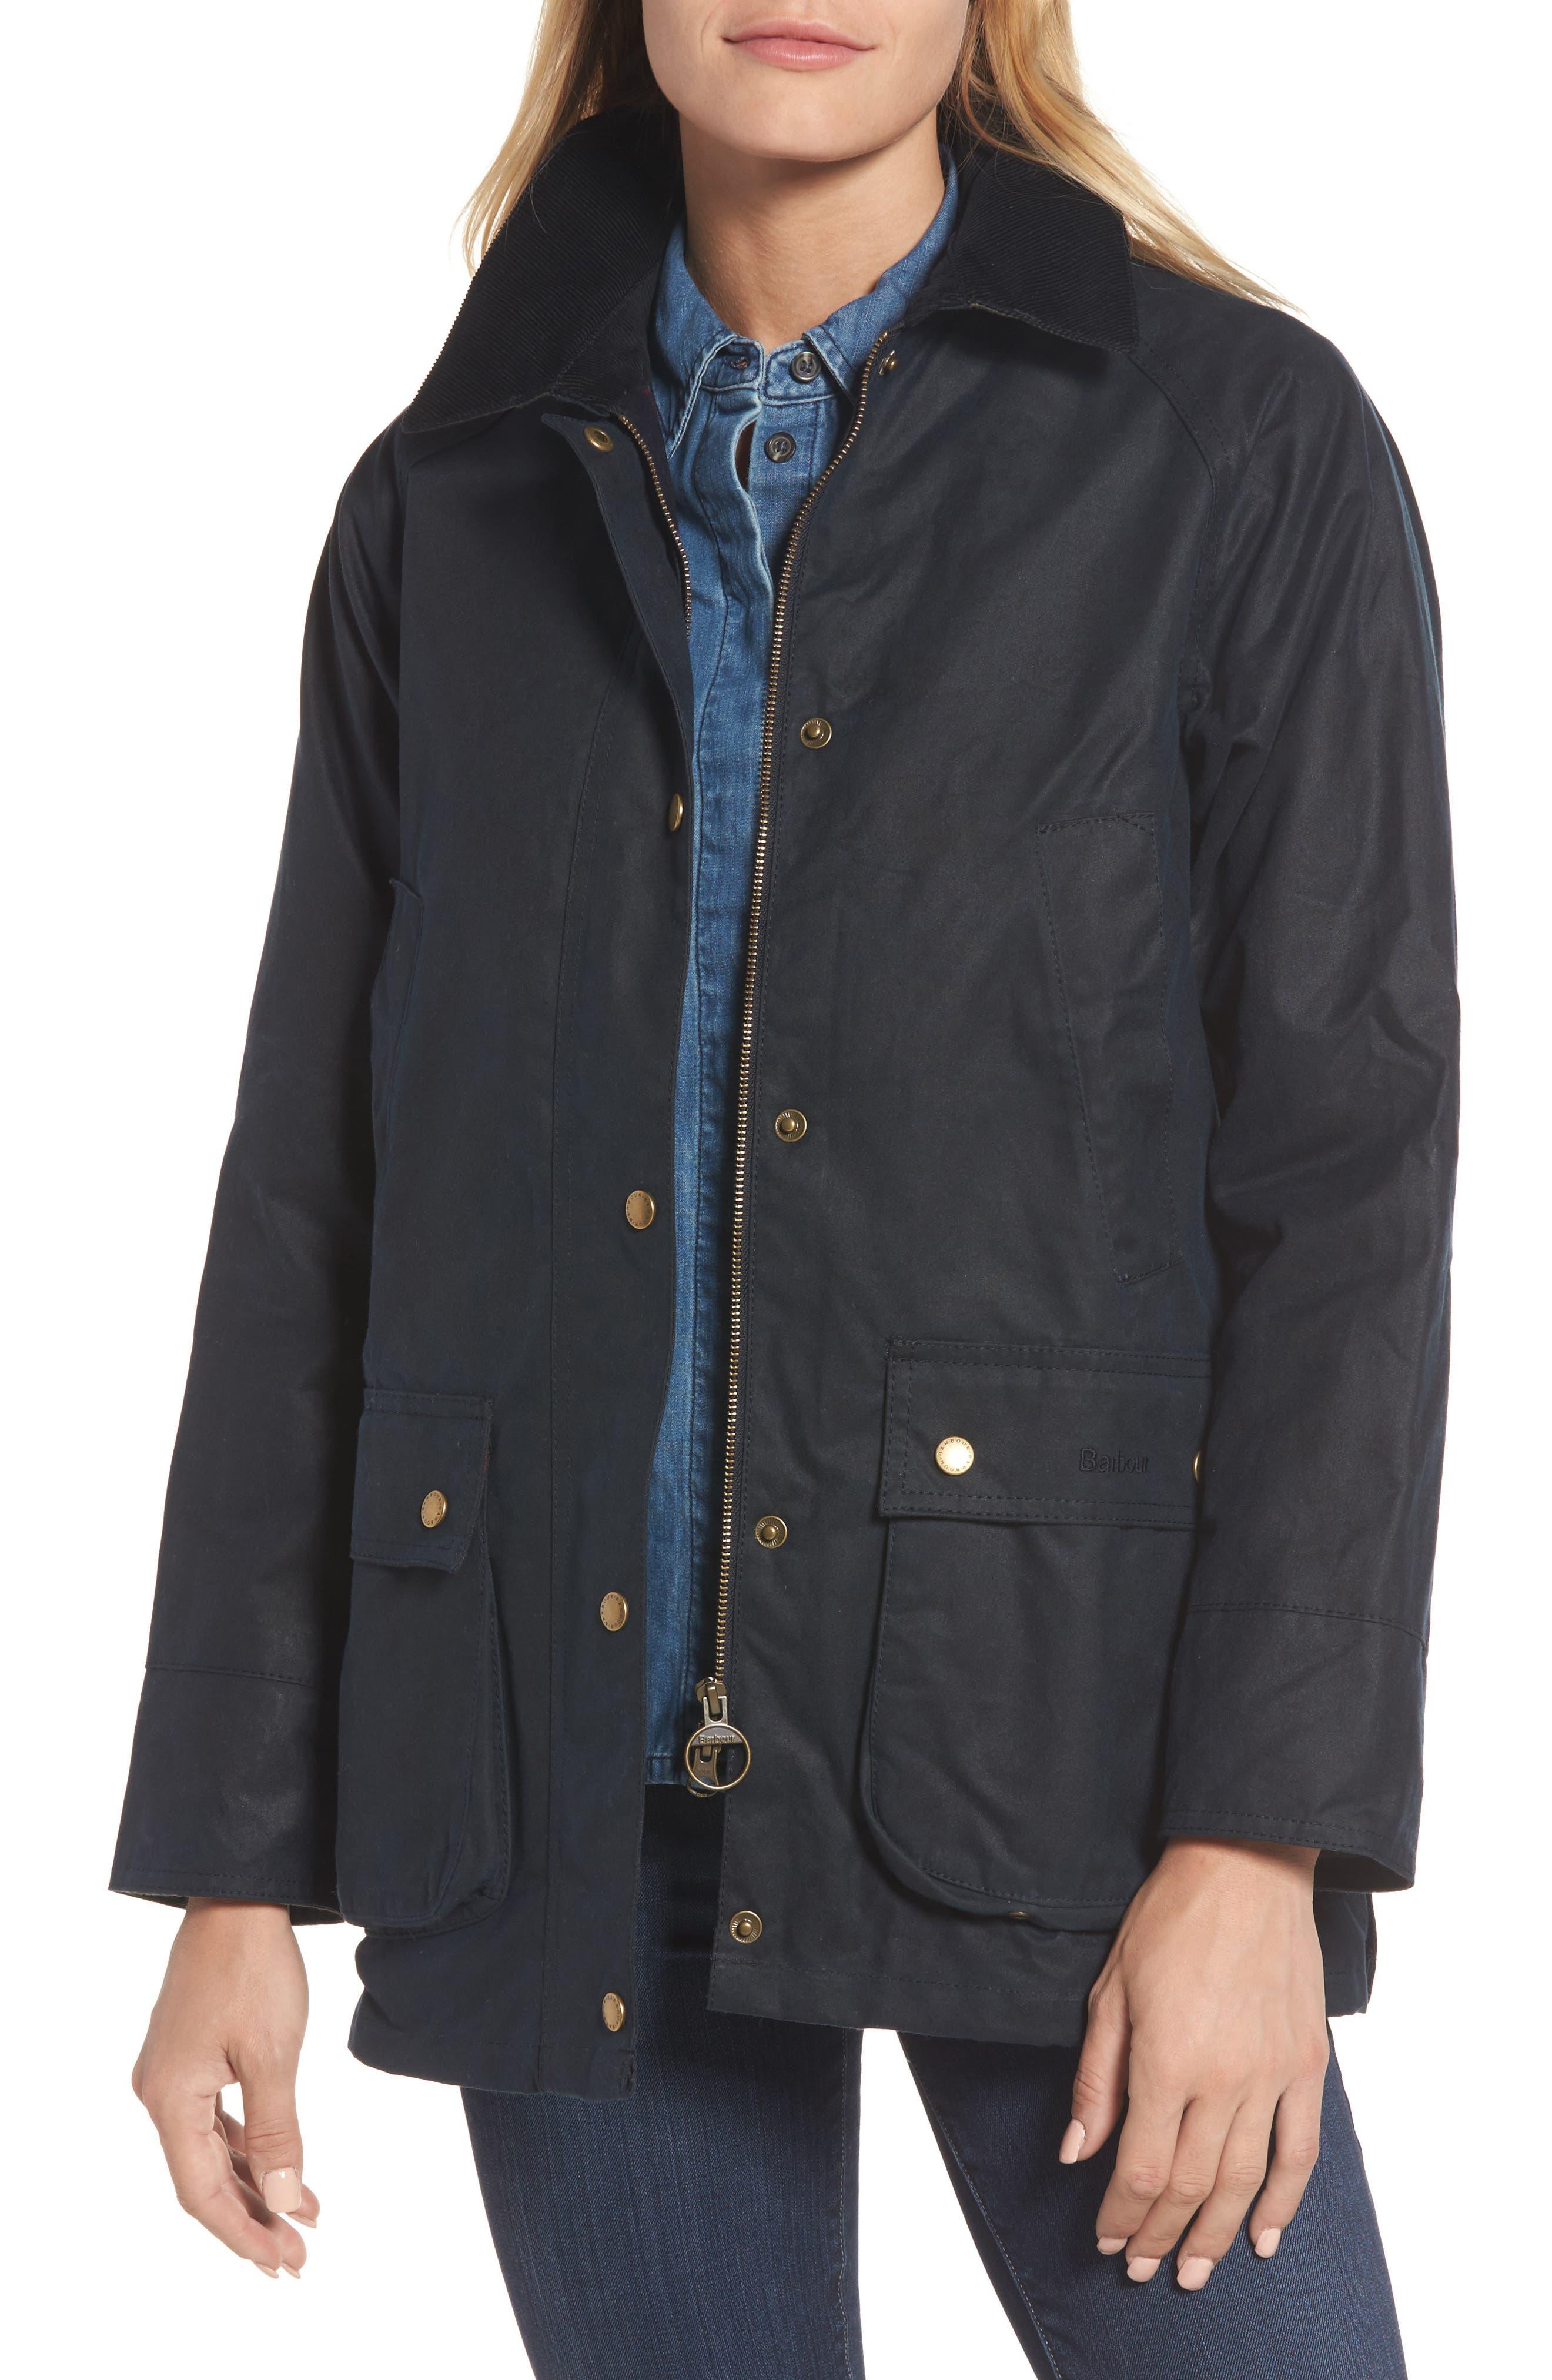 Barbour Acorn Field Jacket, US / 10 UK - Blue